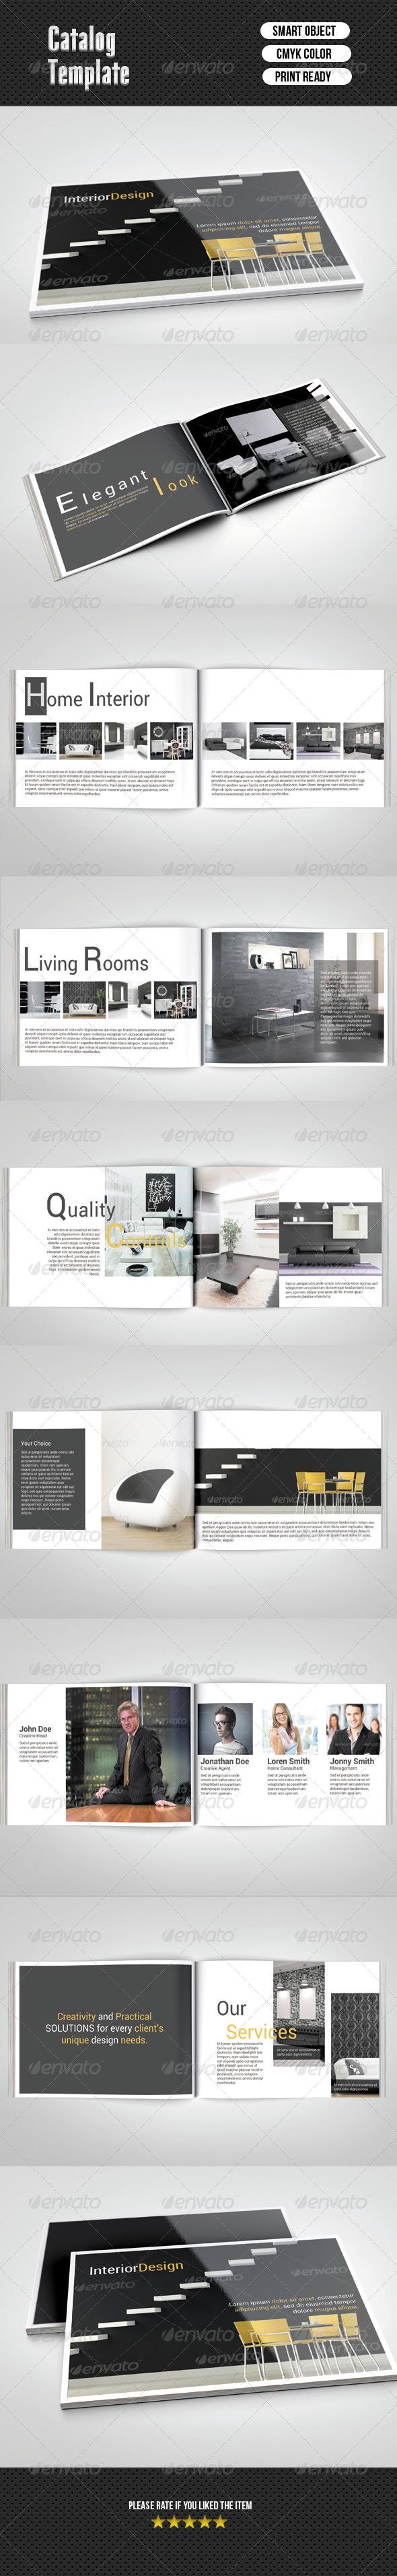 Catalog- Interior Design (16 Pages)